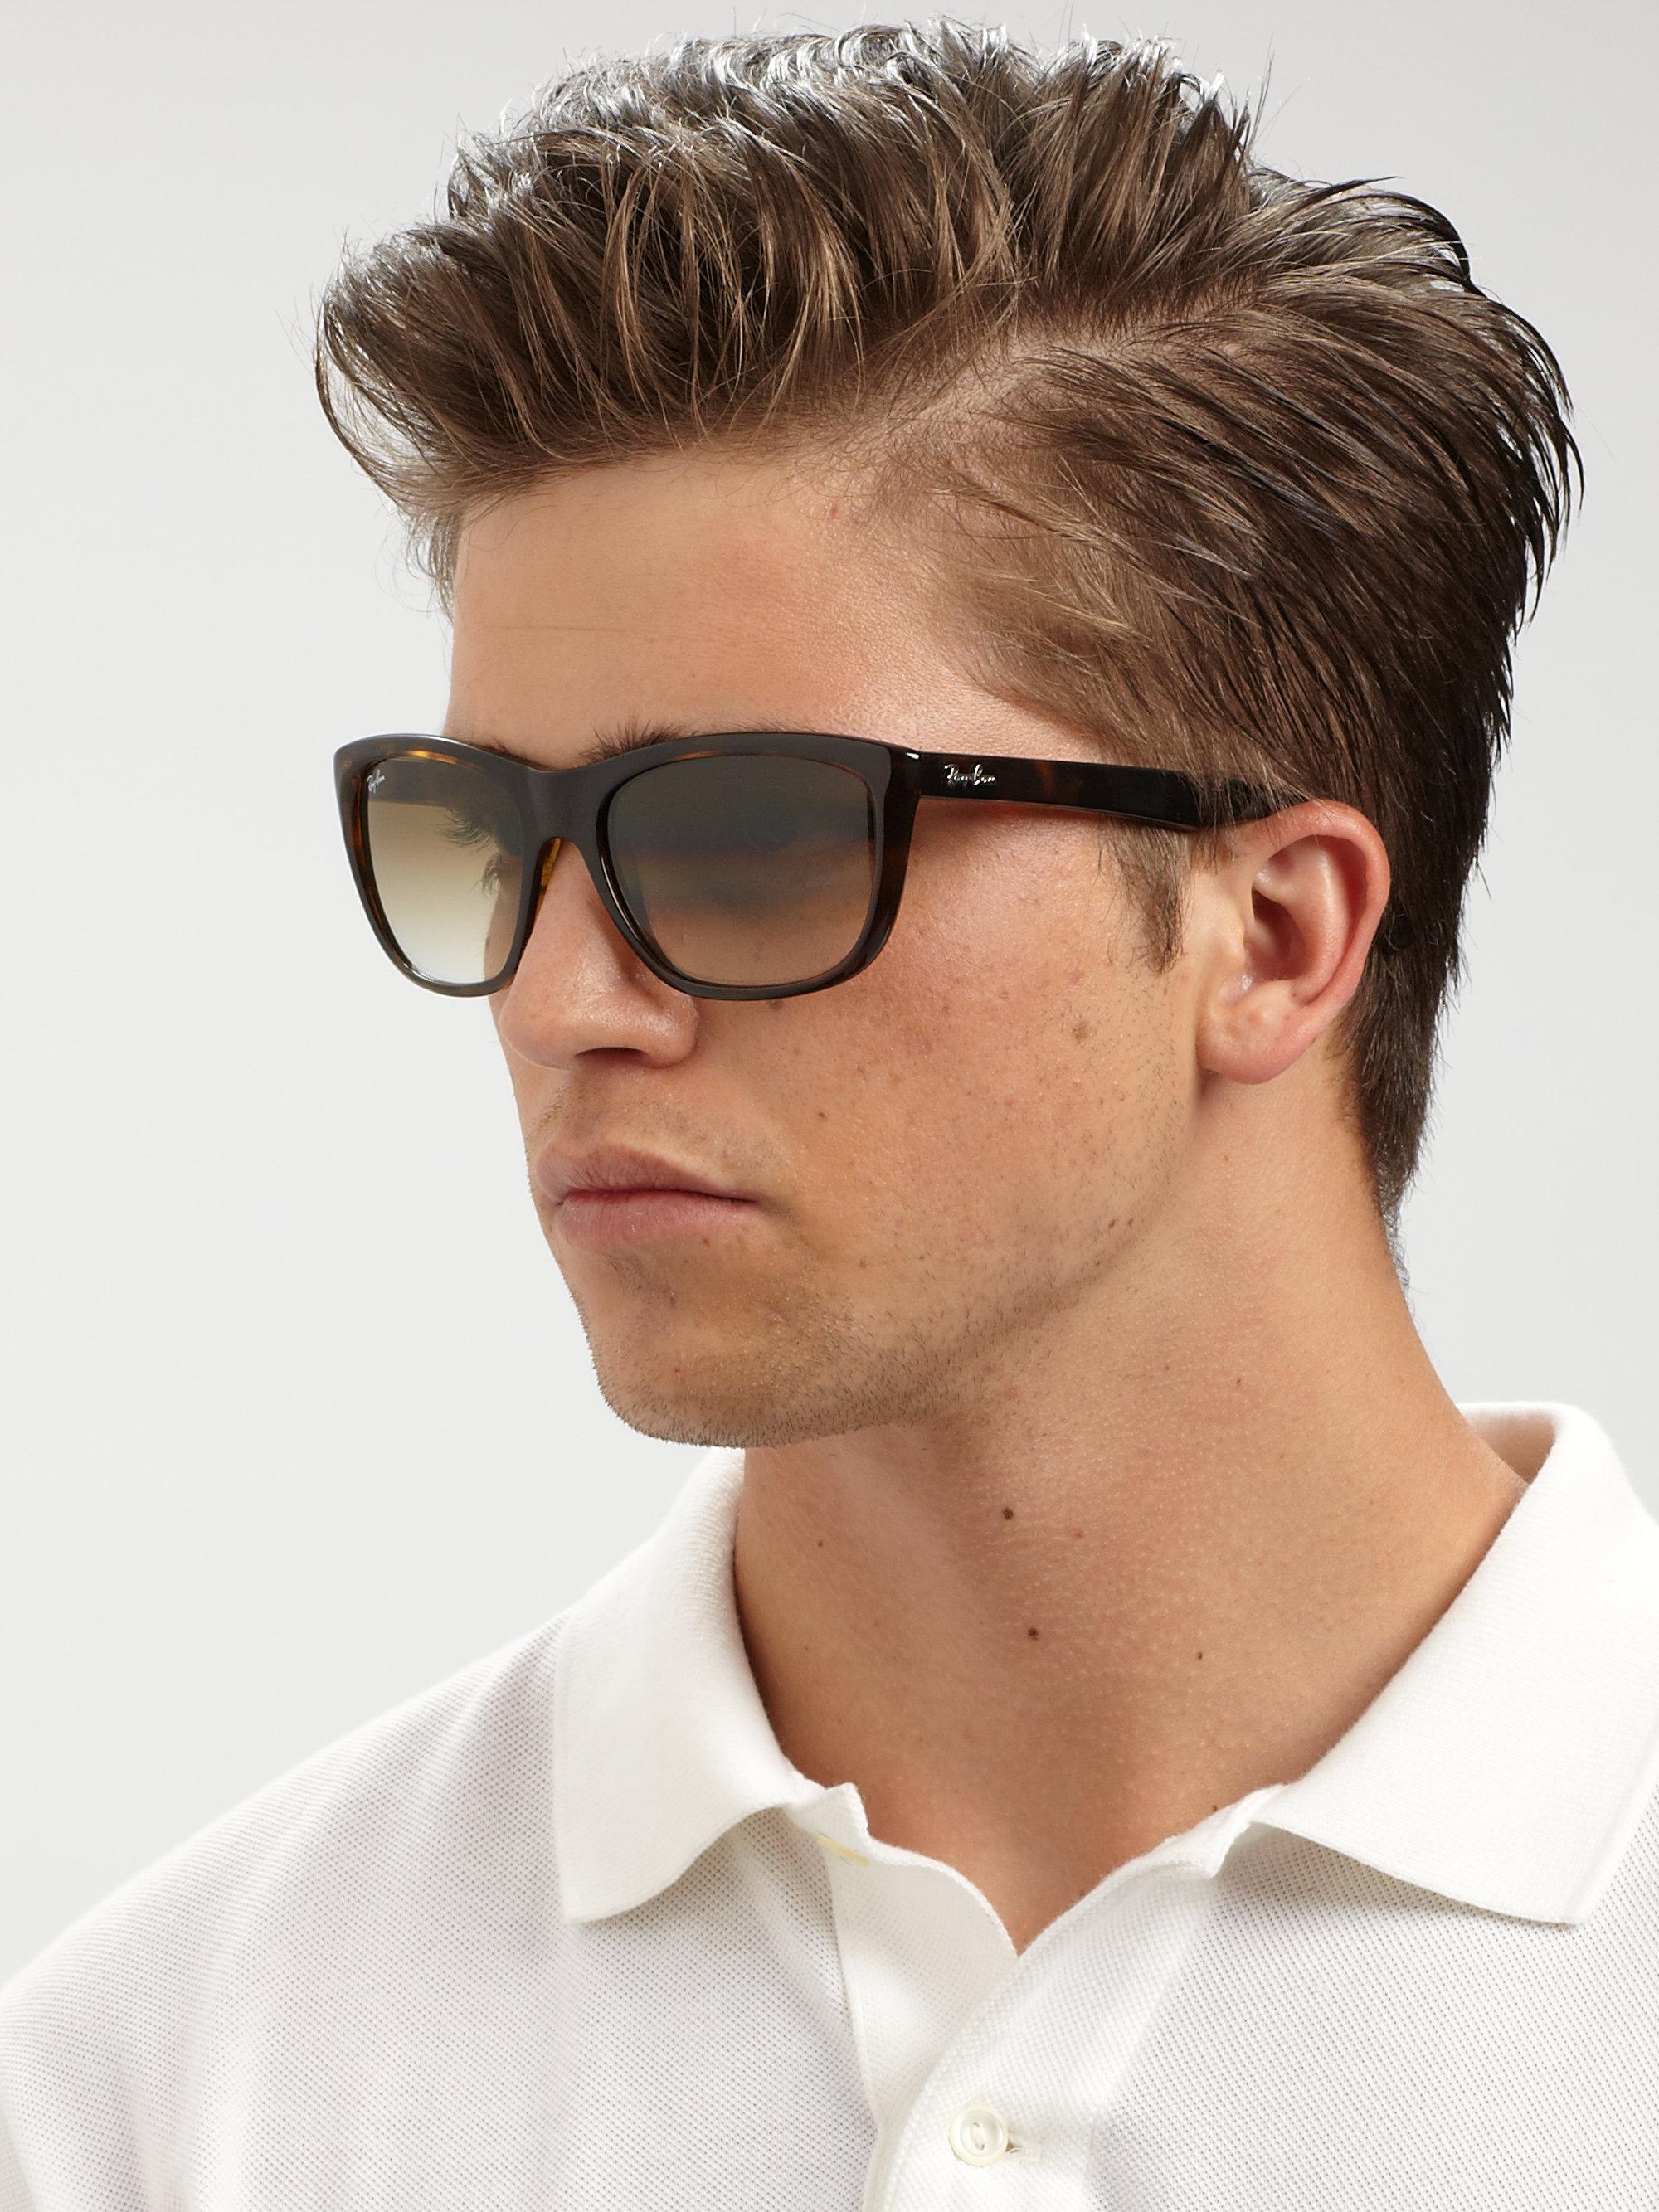 ray ban duplicate sunglasses online shopping 0tcv  duplicate ray ban sunglasses online shopping